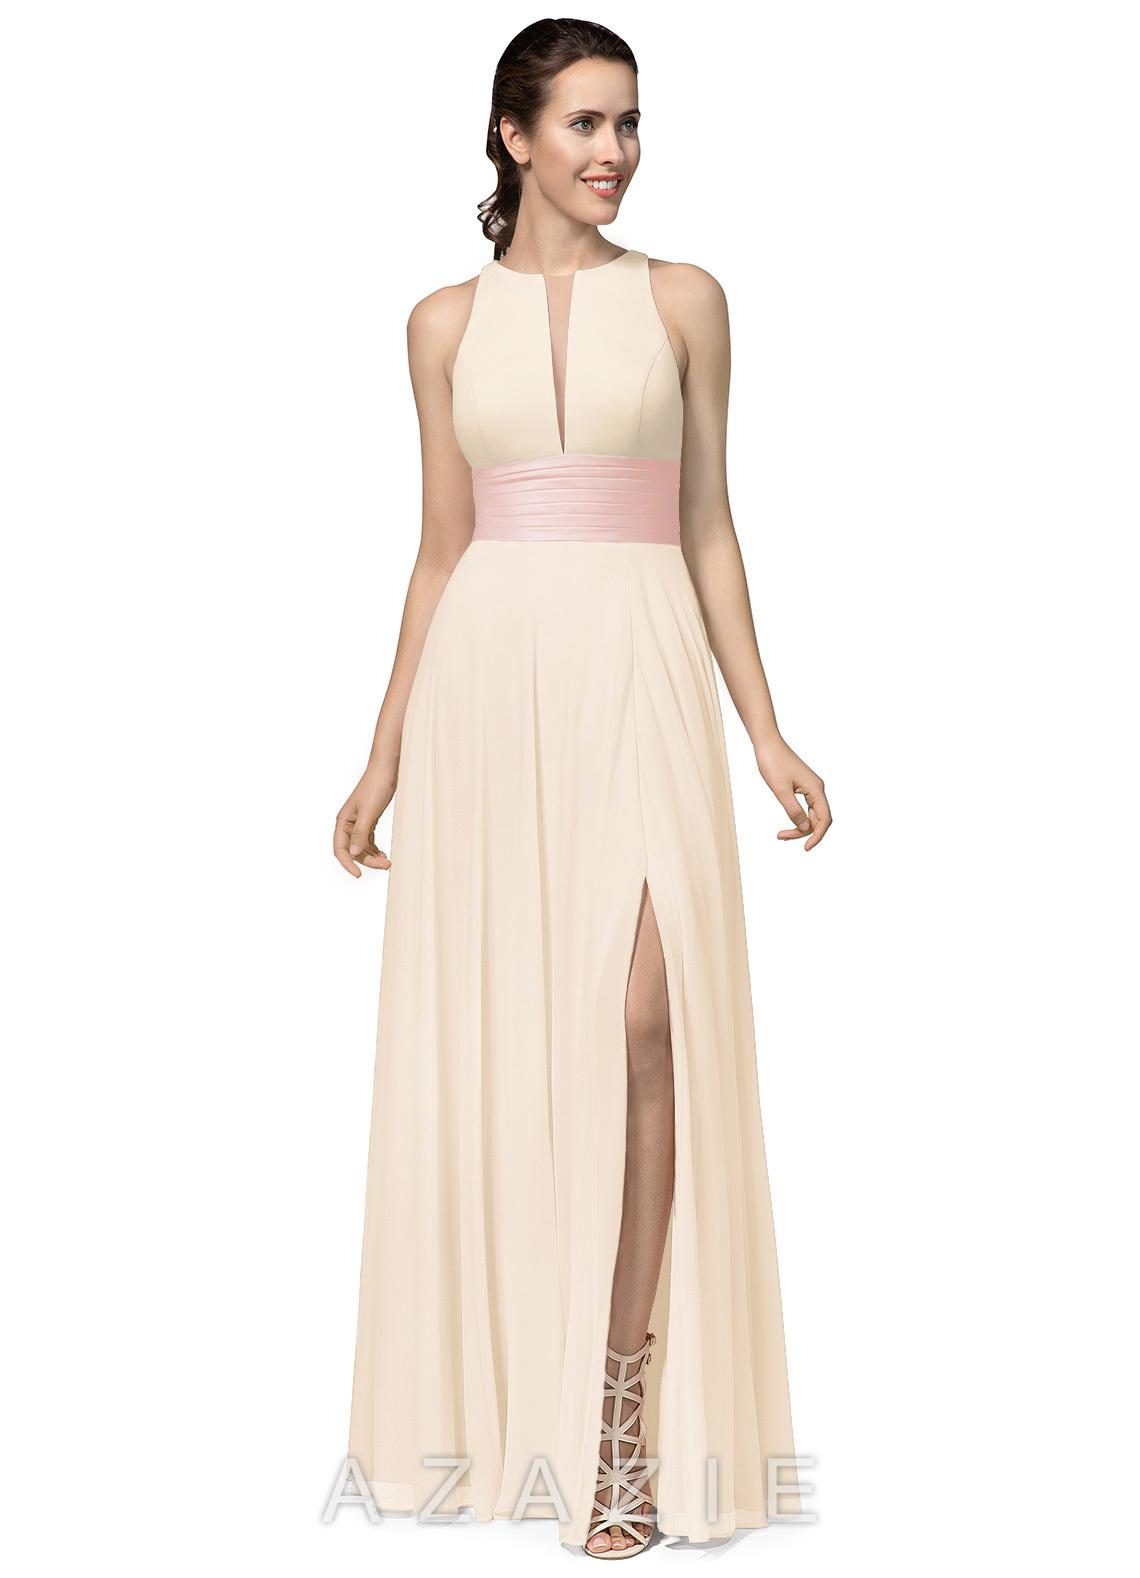 4cc392604d8 Azazie Loretta Bridesmaid Dress